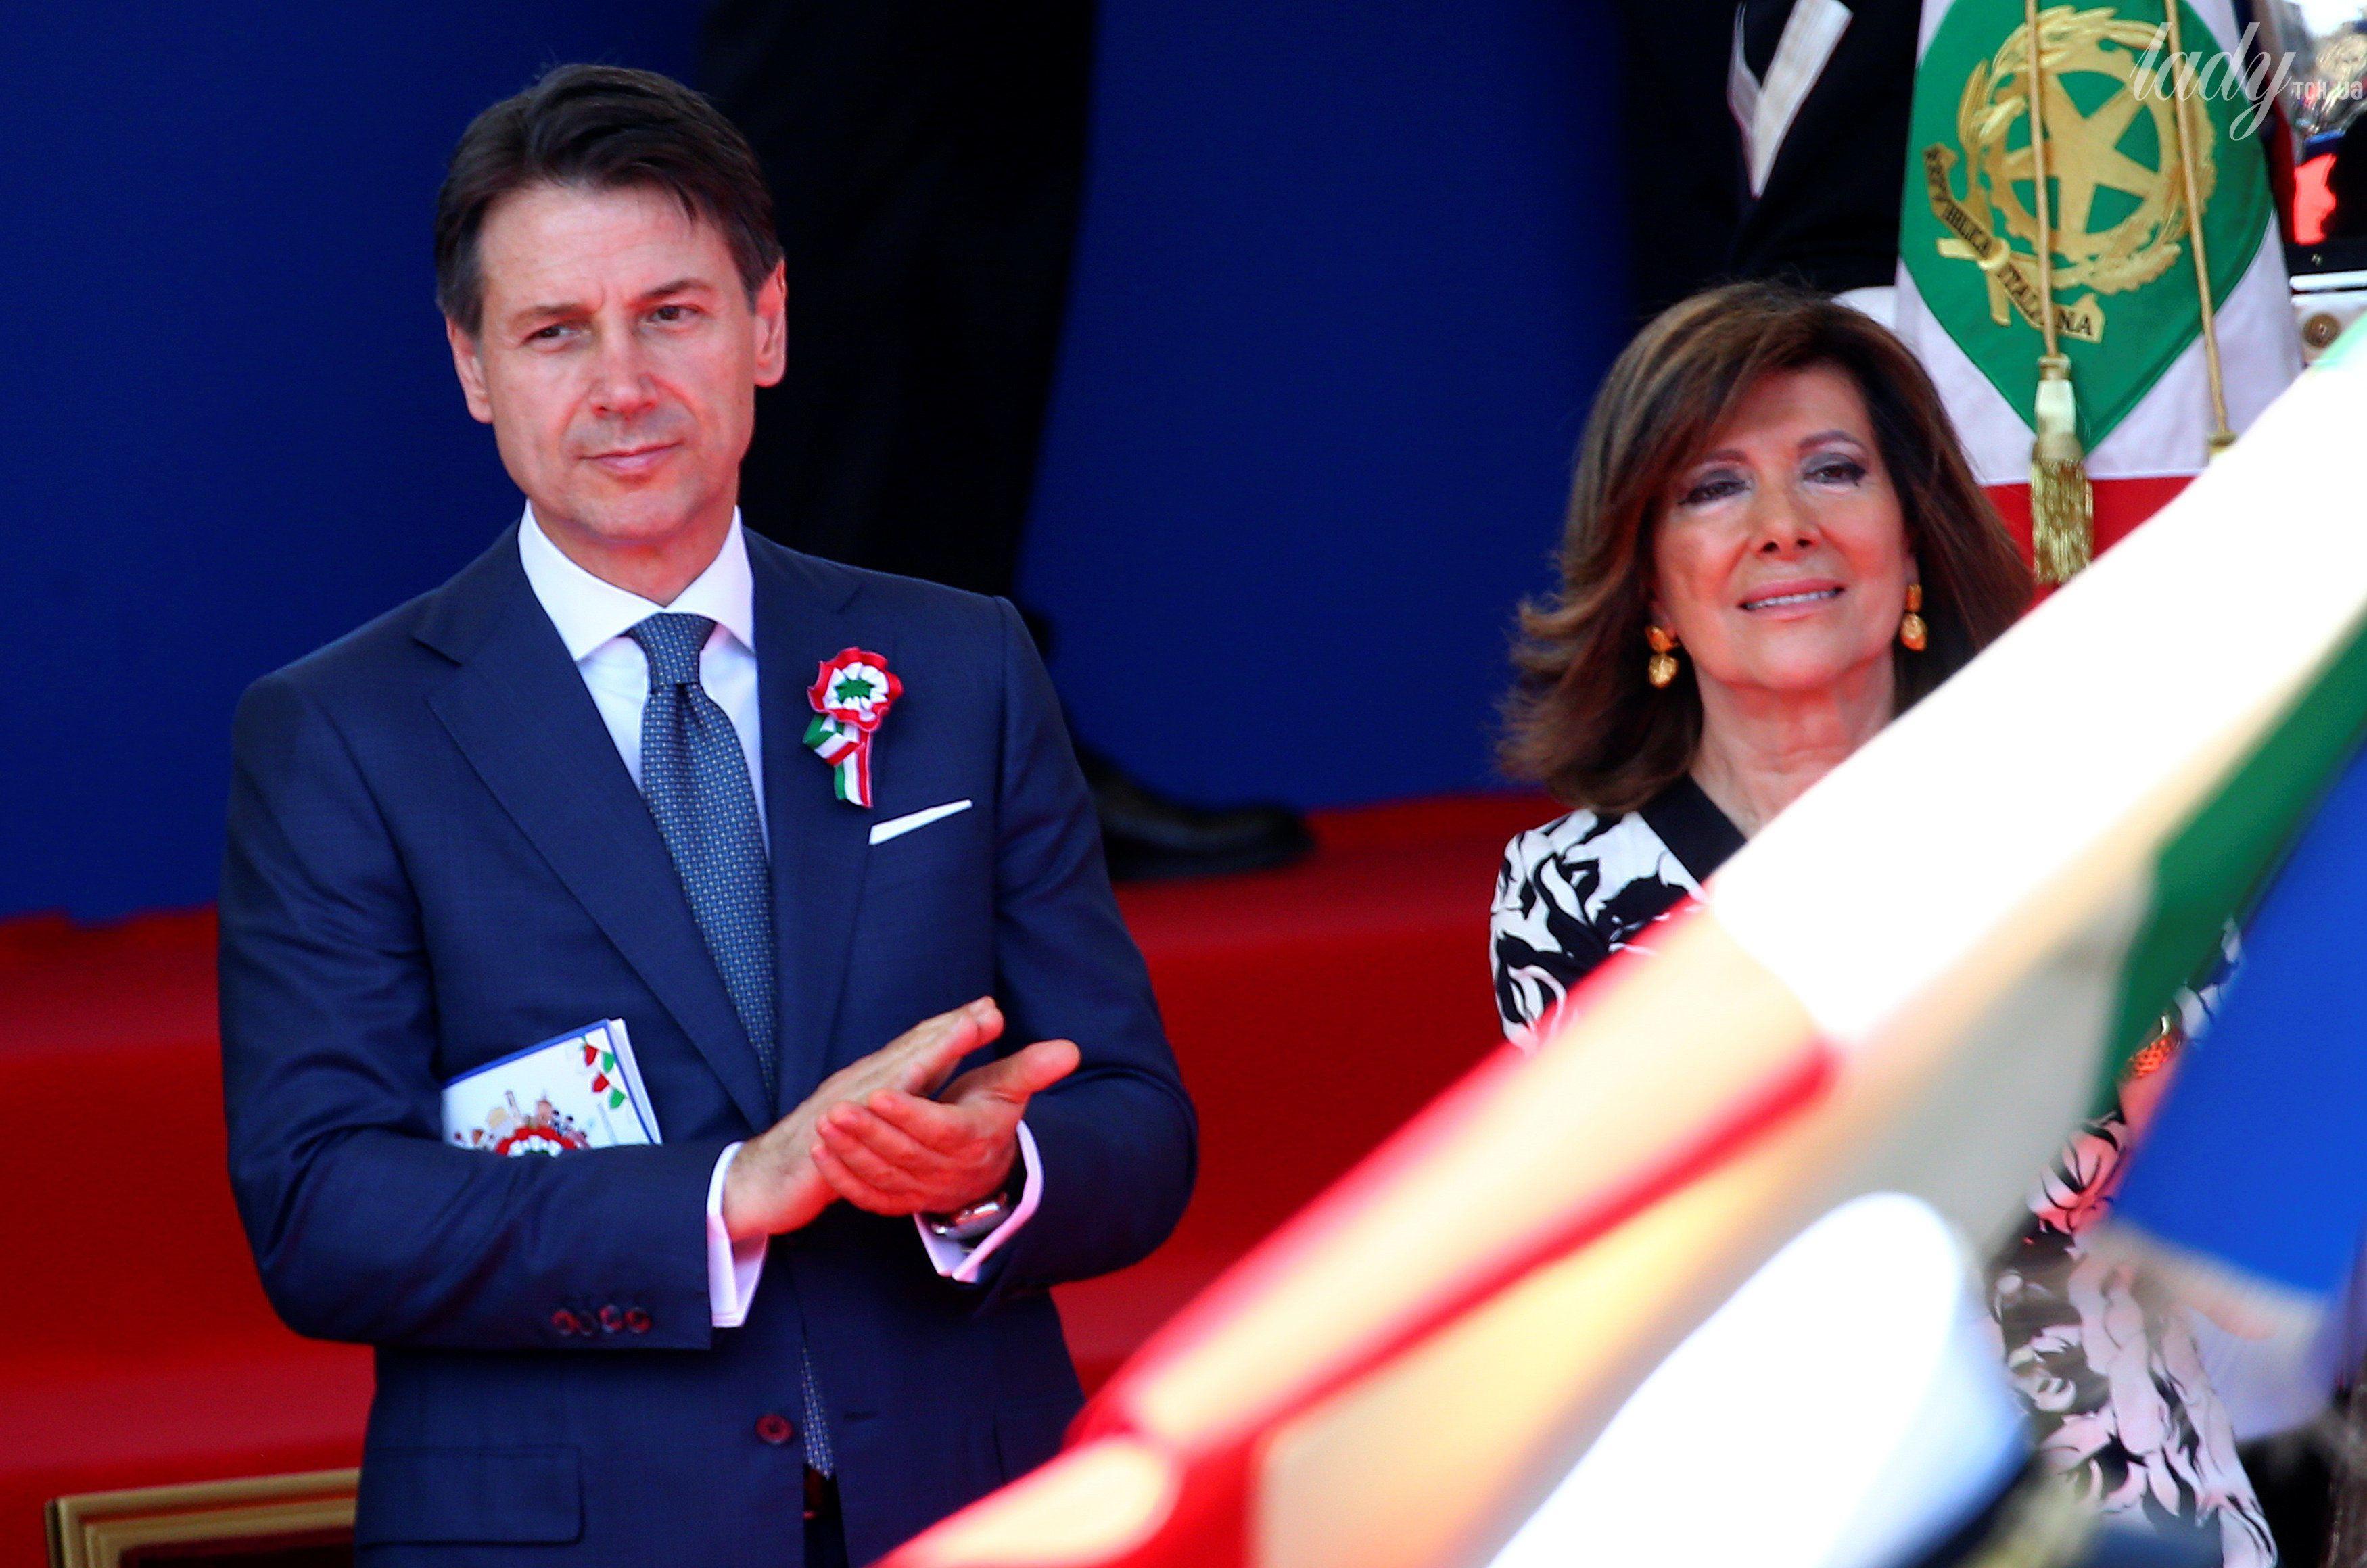 Председатель сената Италии Мария Элизабетта Альберти Казеллати_2